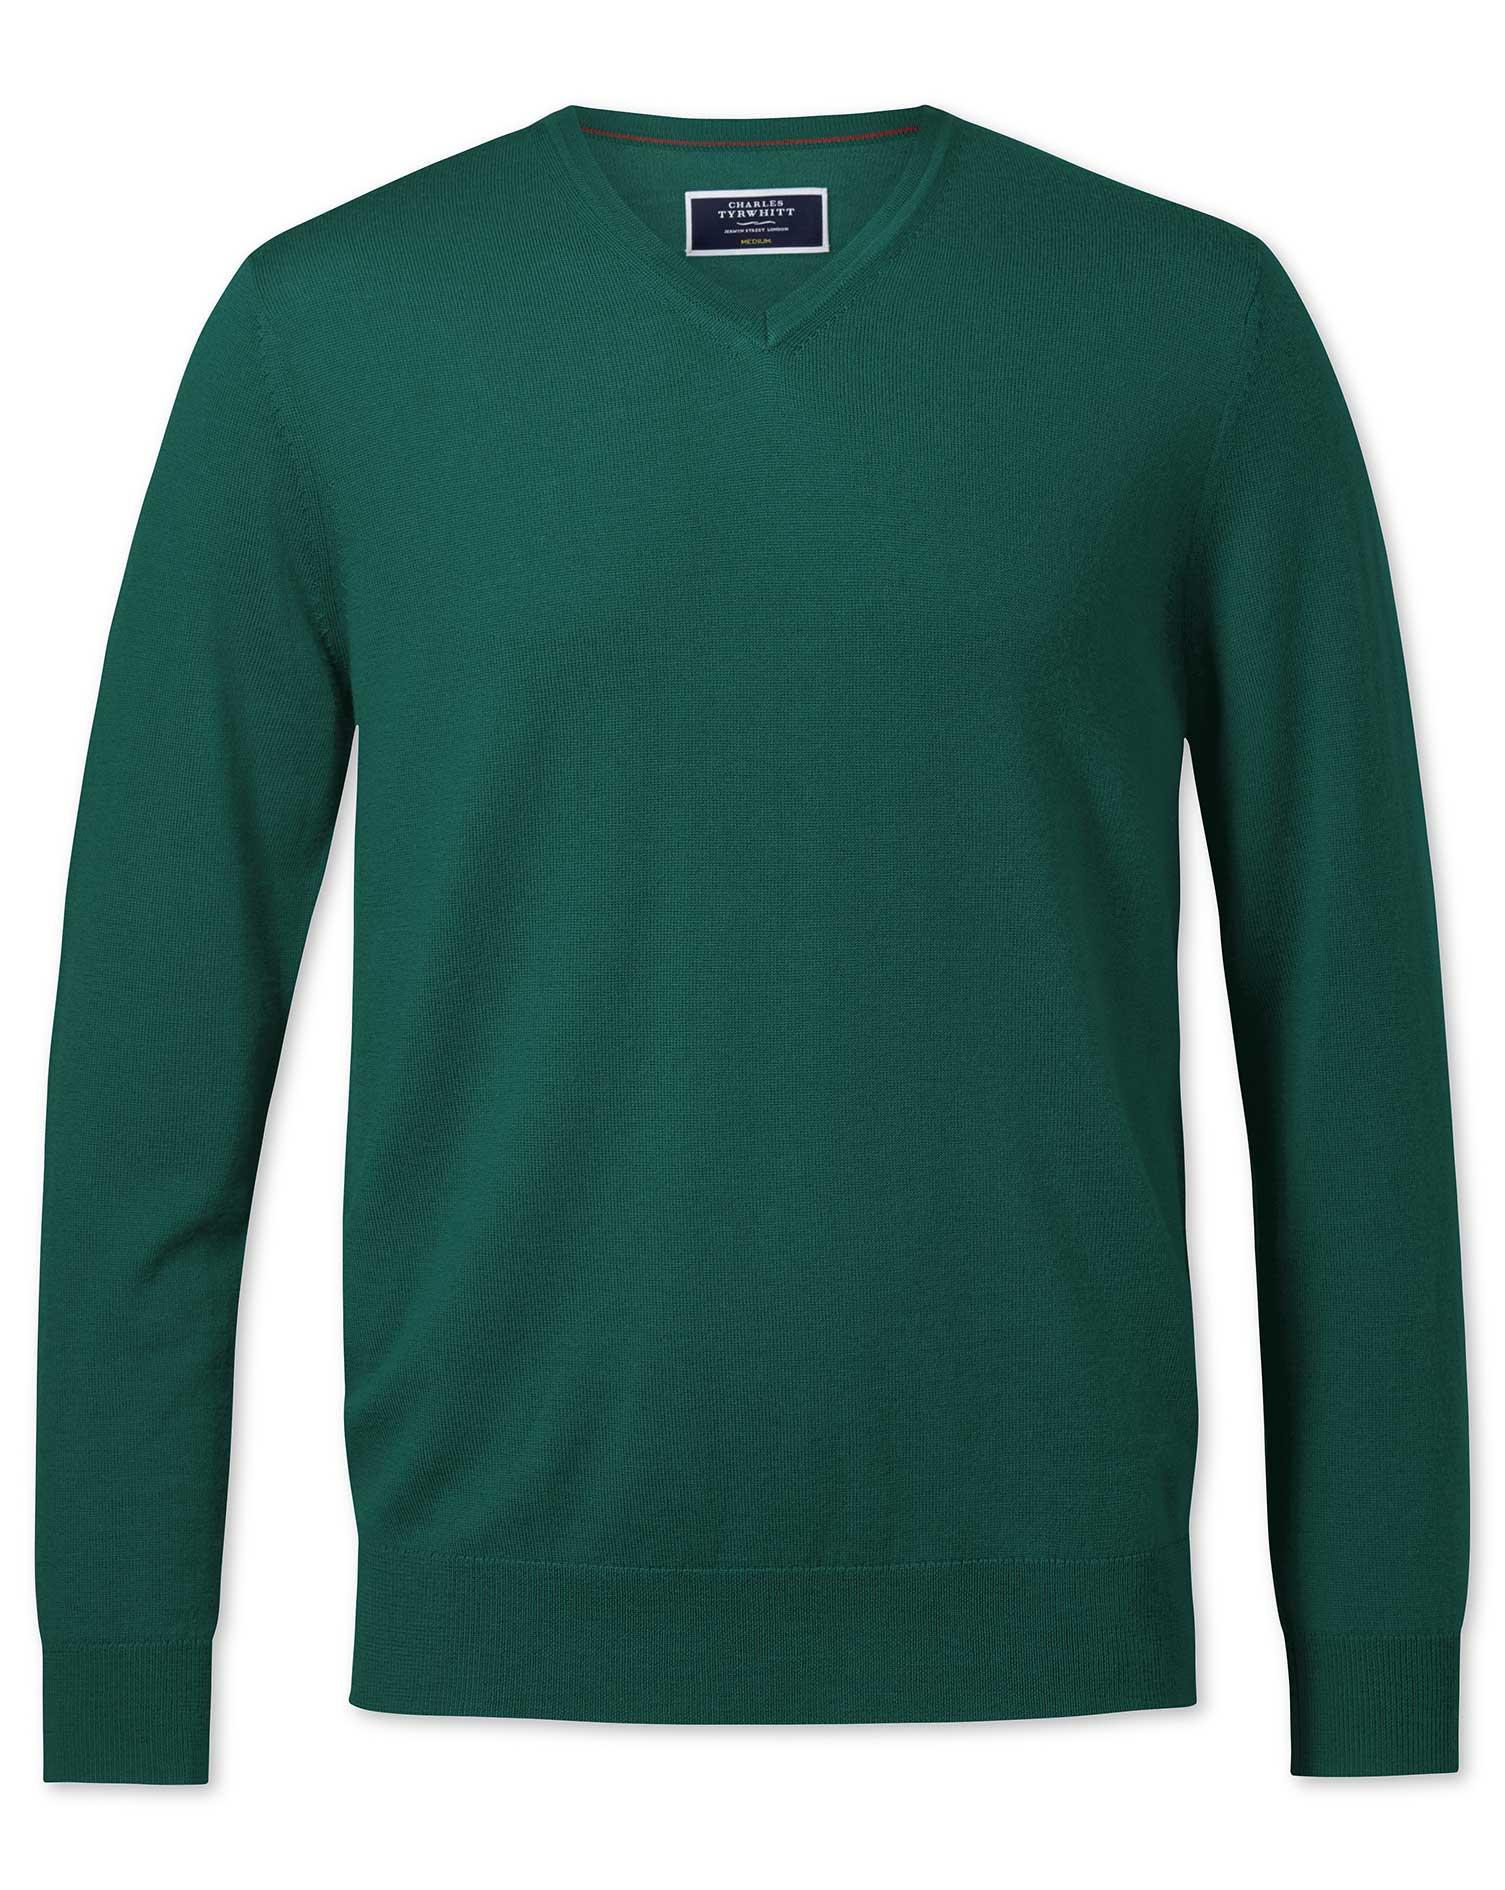 Dark Green Merino V-Neck Merino Wool Jumper Size Medium by Charles Tyrwhitt